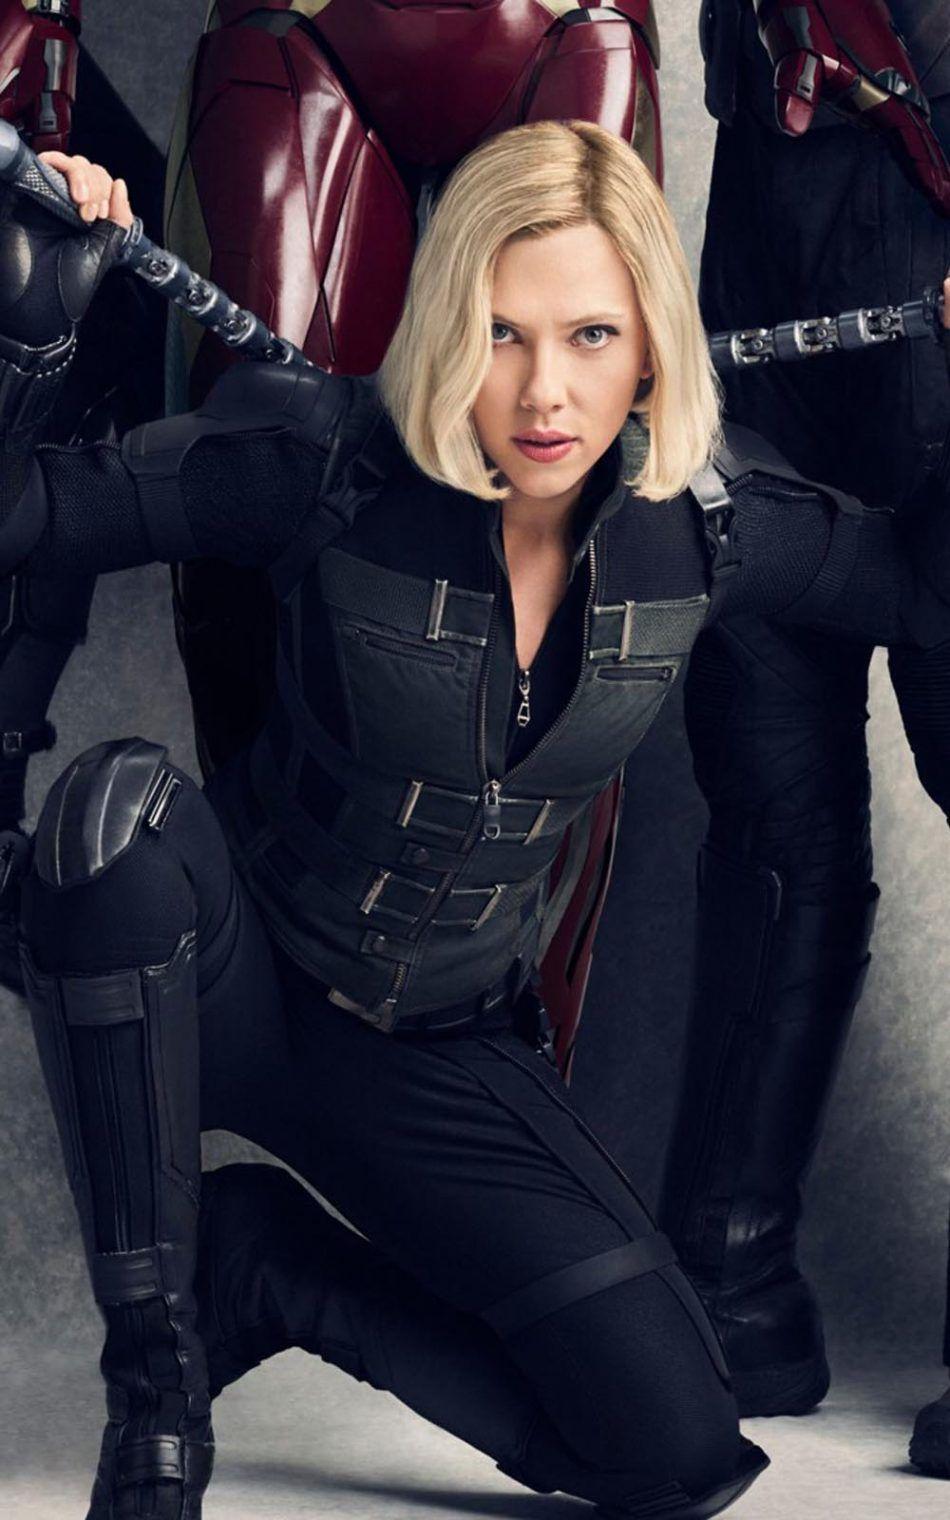 Scarlett Johansson Avengers Wallpapers Top Free Scarlett